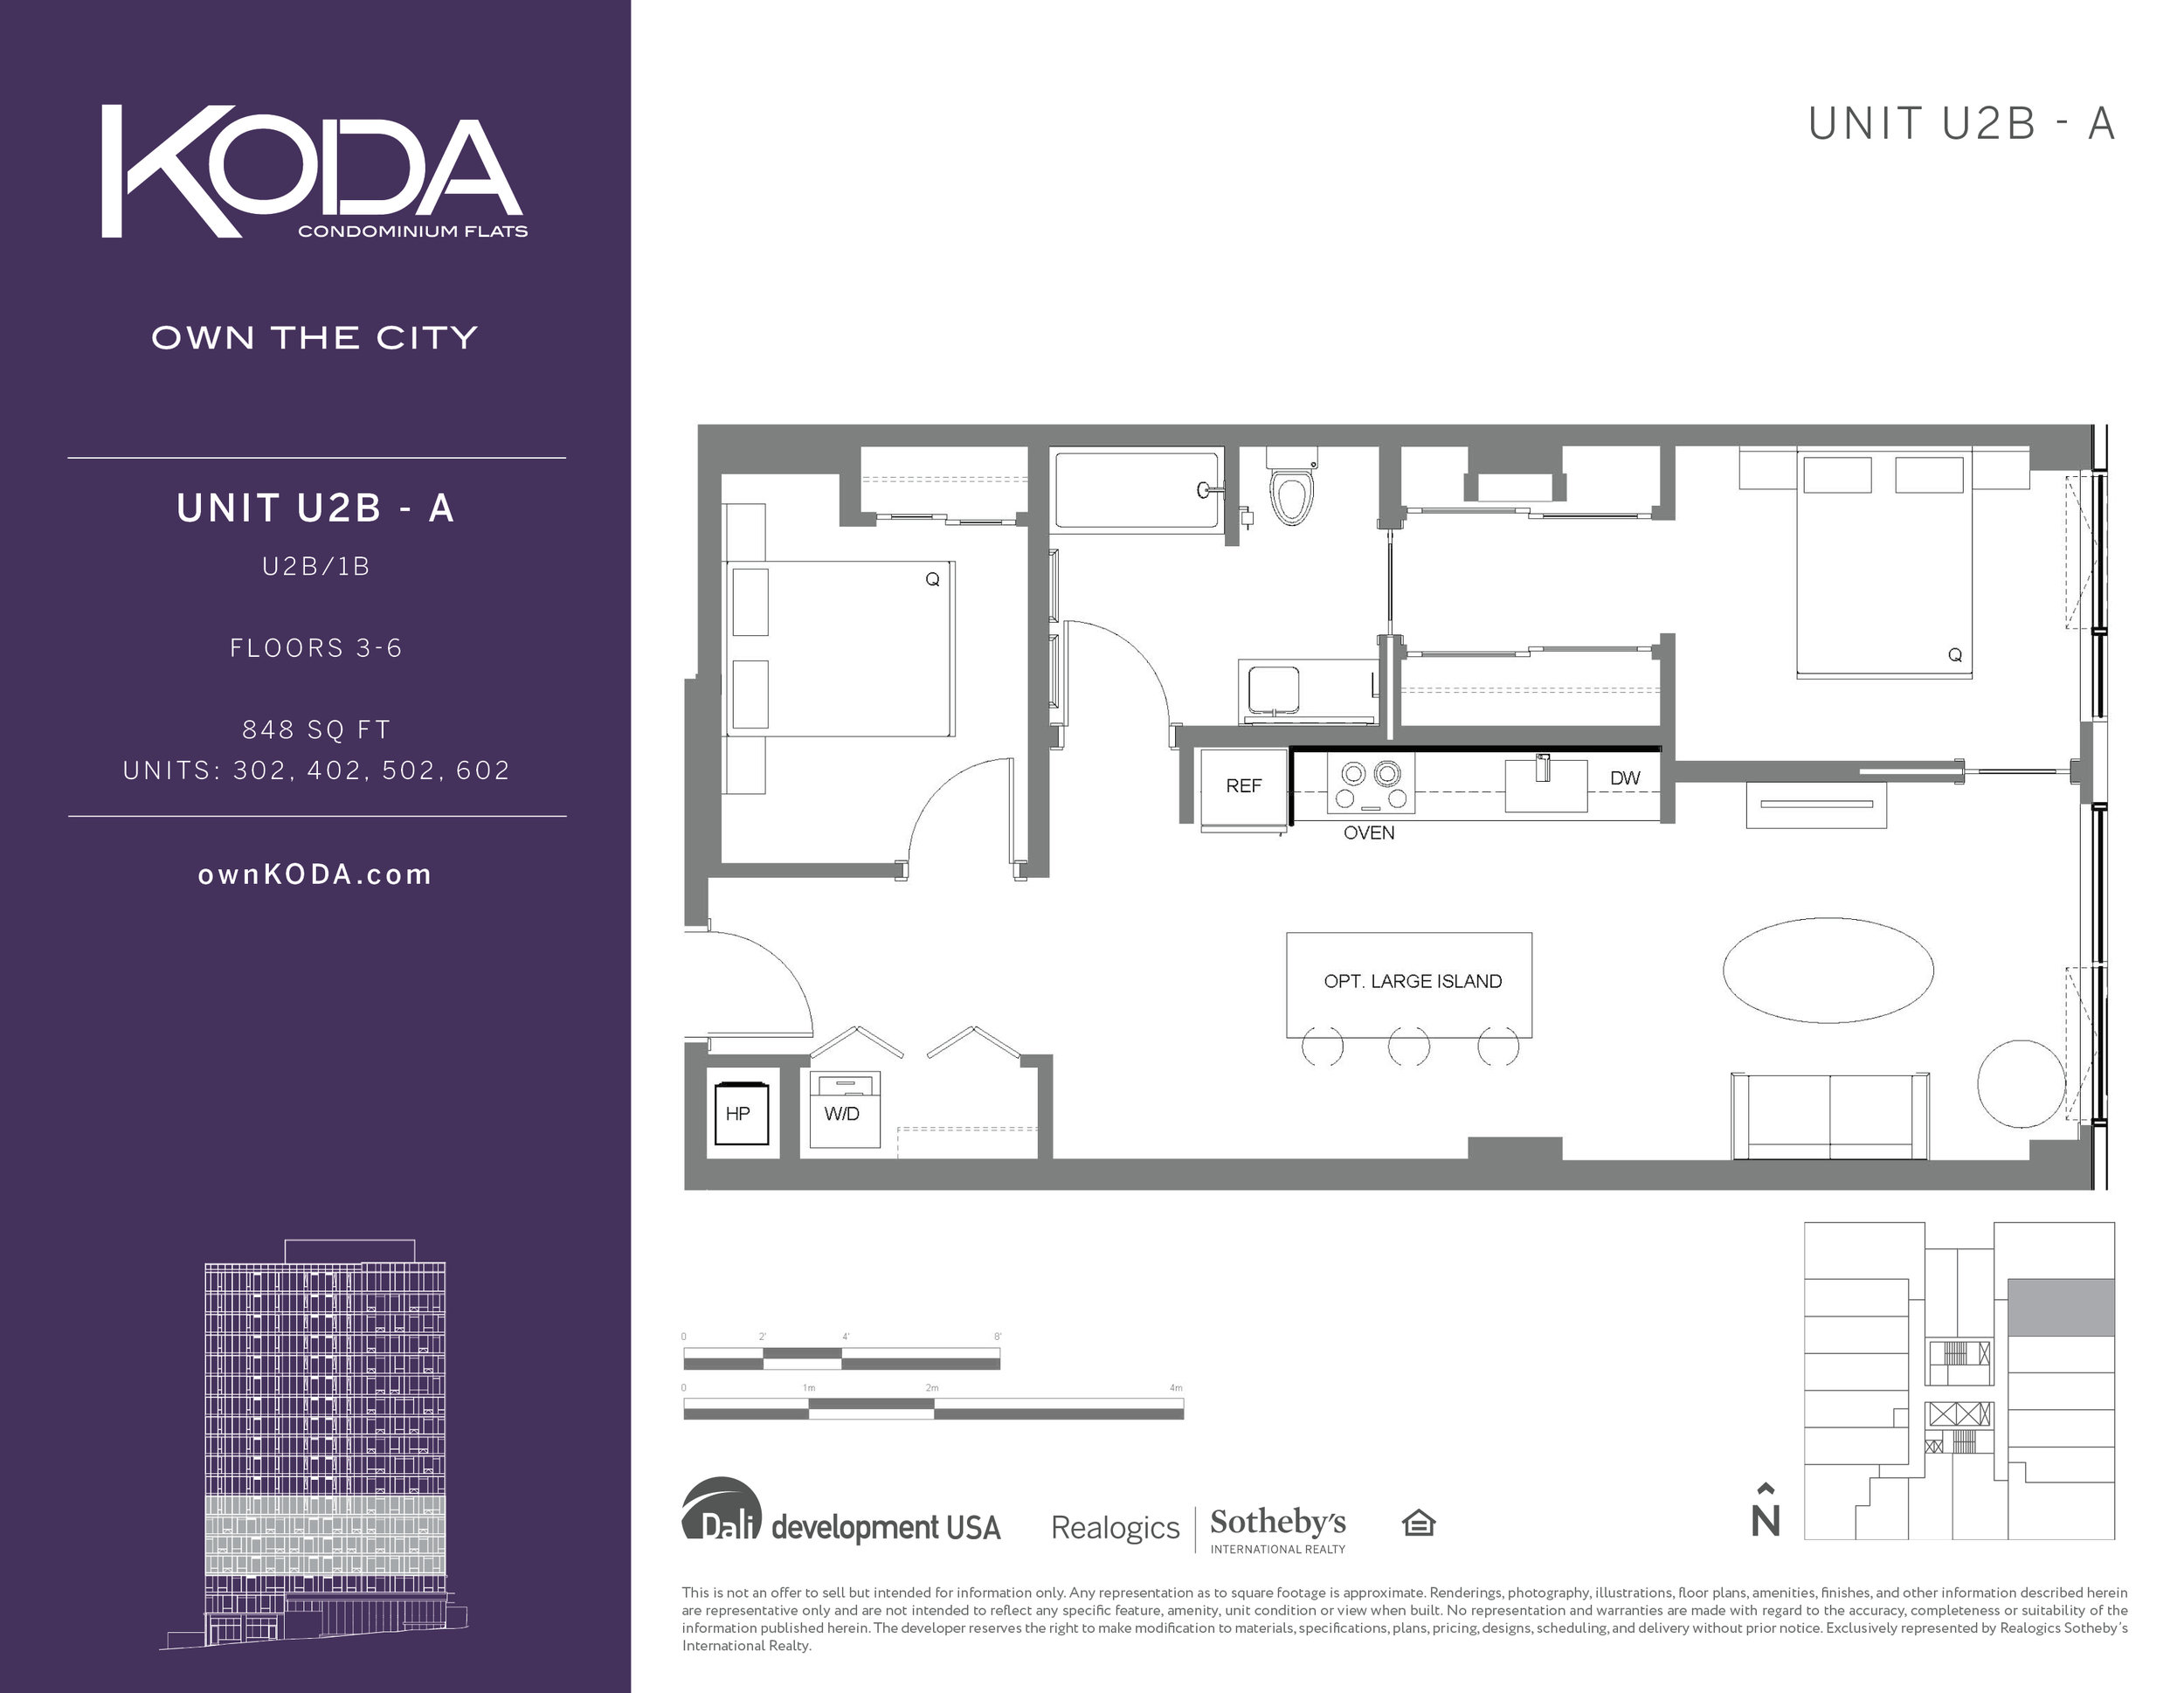 KODA_FloorPlanFlyer_Update_Approved_04.04.19_Release19.jpg